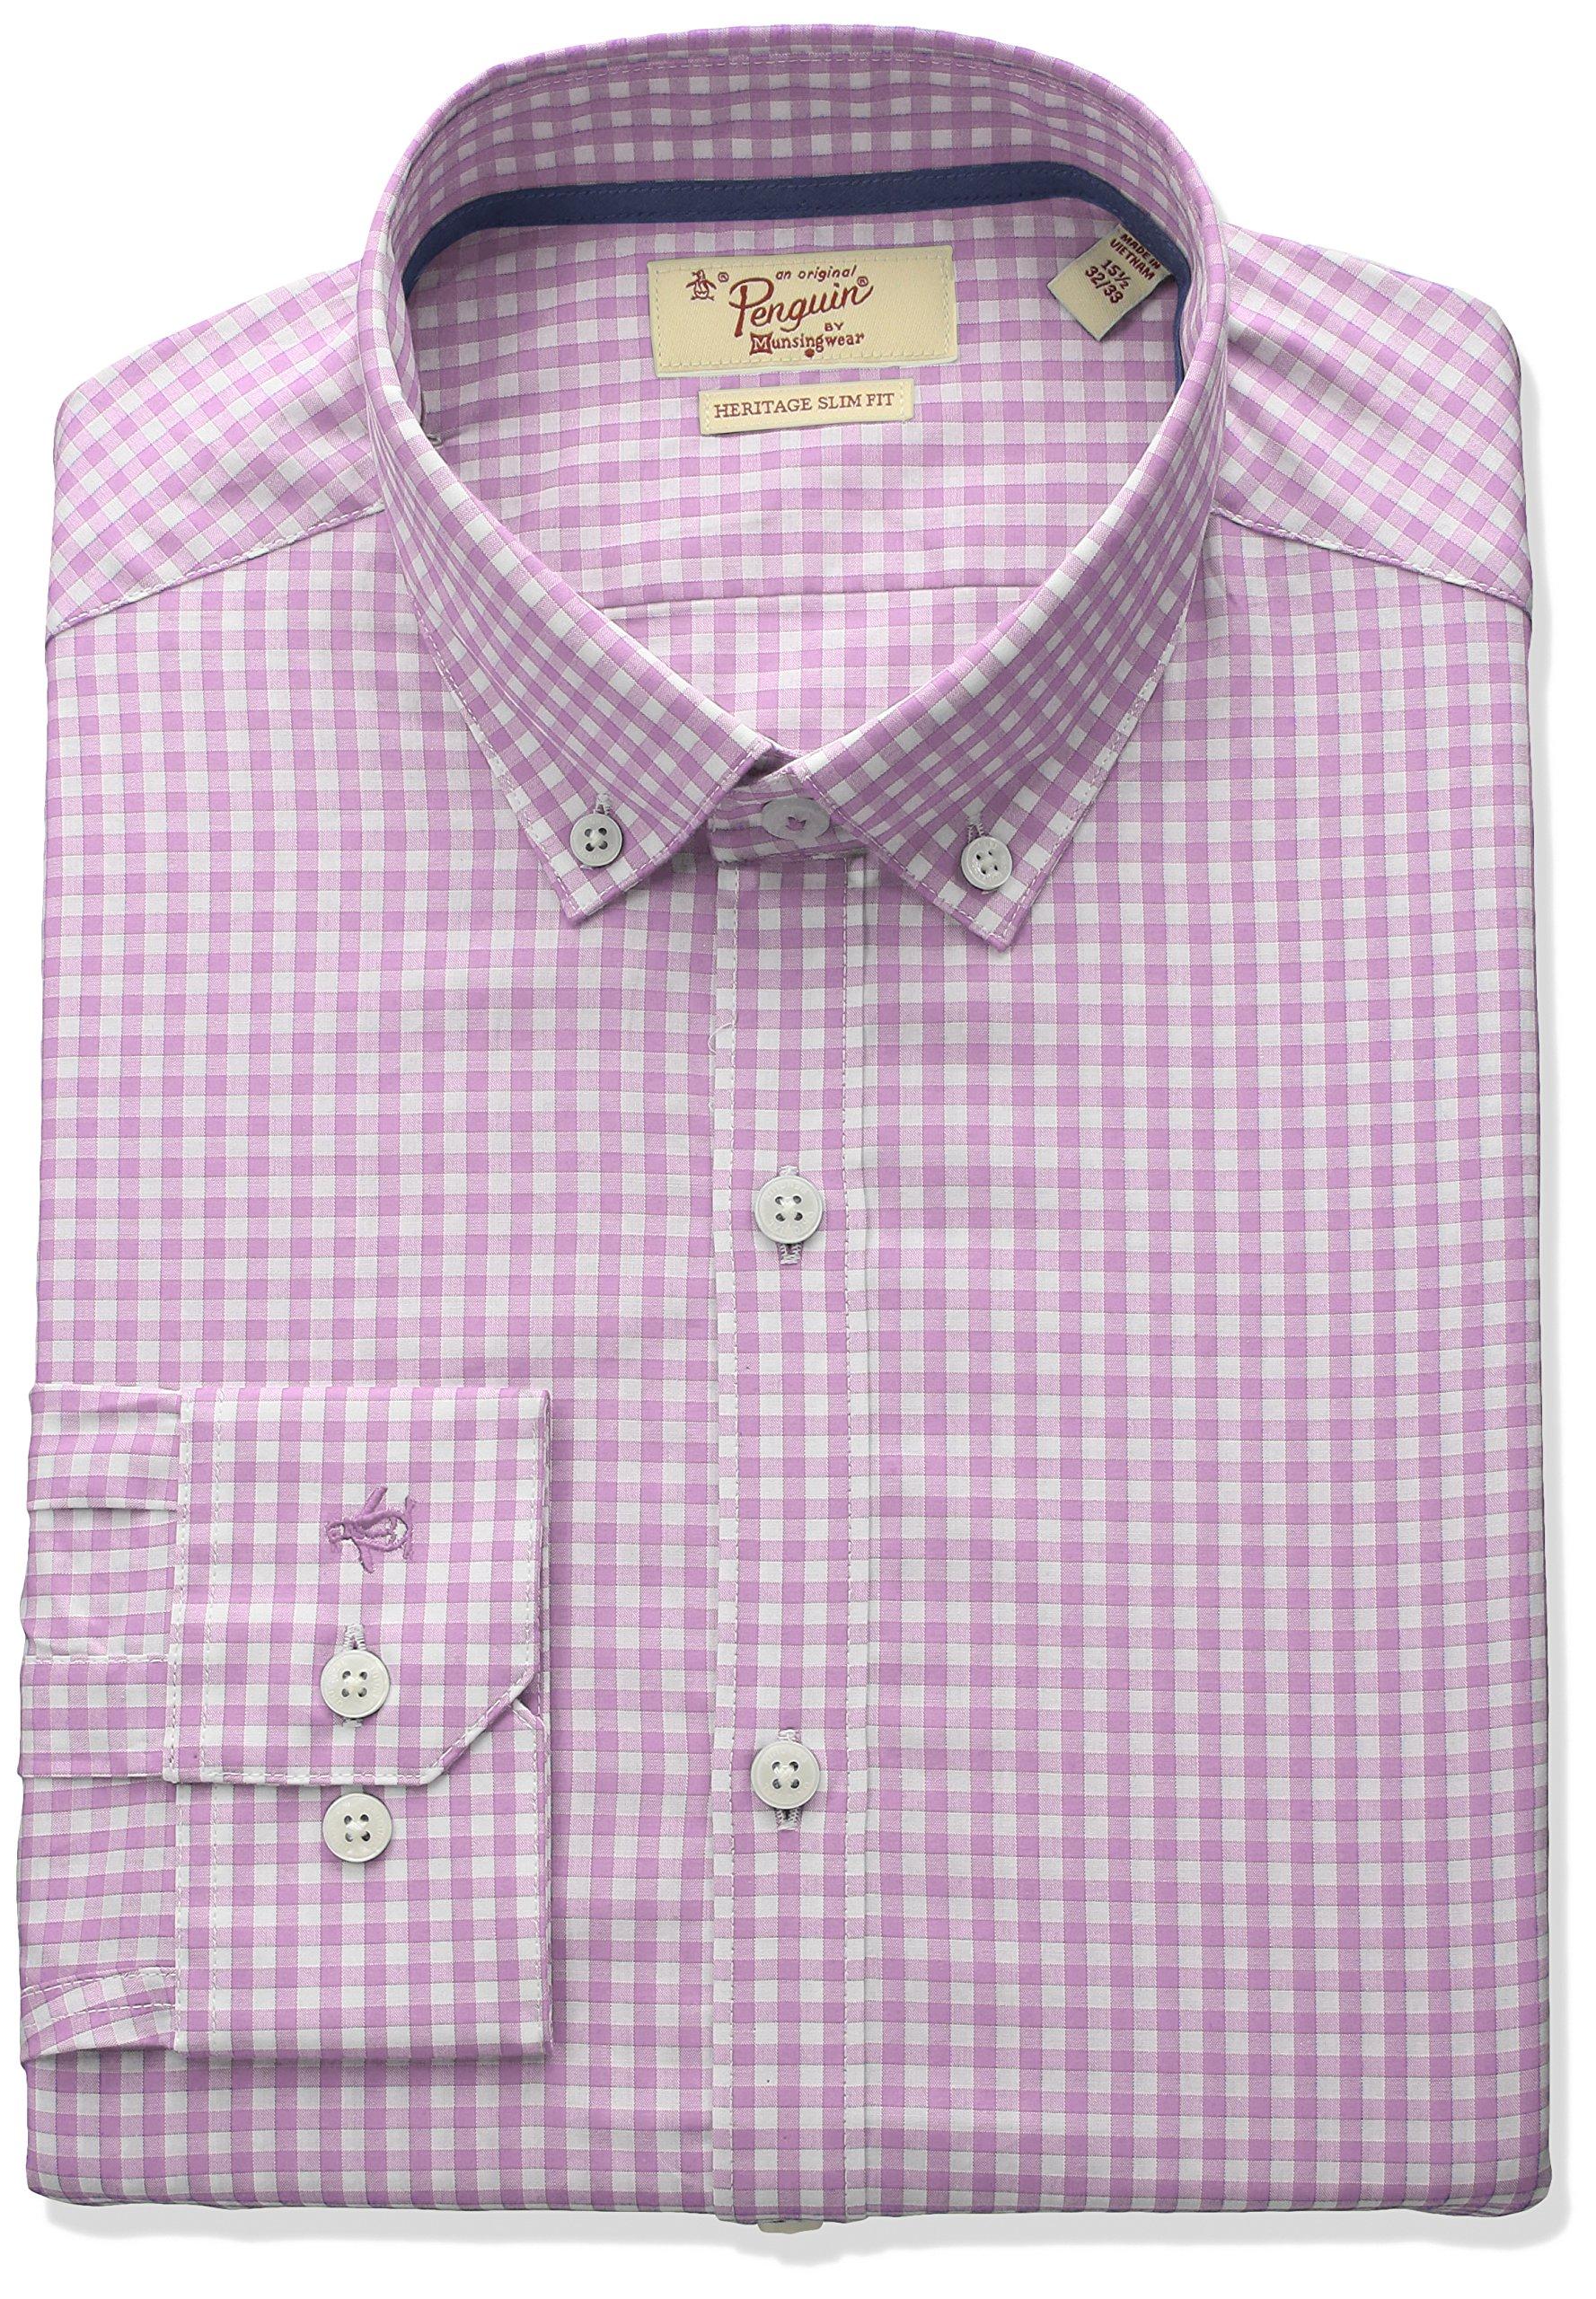 Original Penguin Men's Slim Fit Button Down Collar Dress Shirt, Pink Gingham, 16.5 34/35